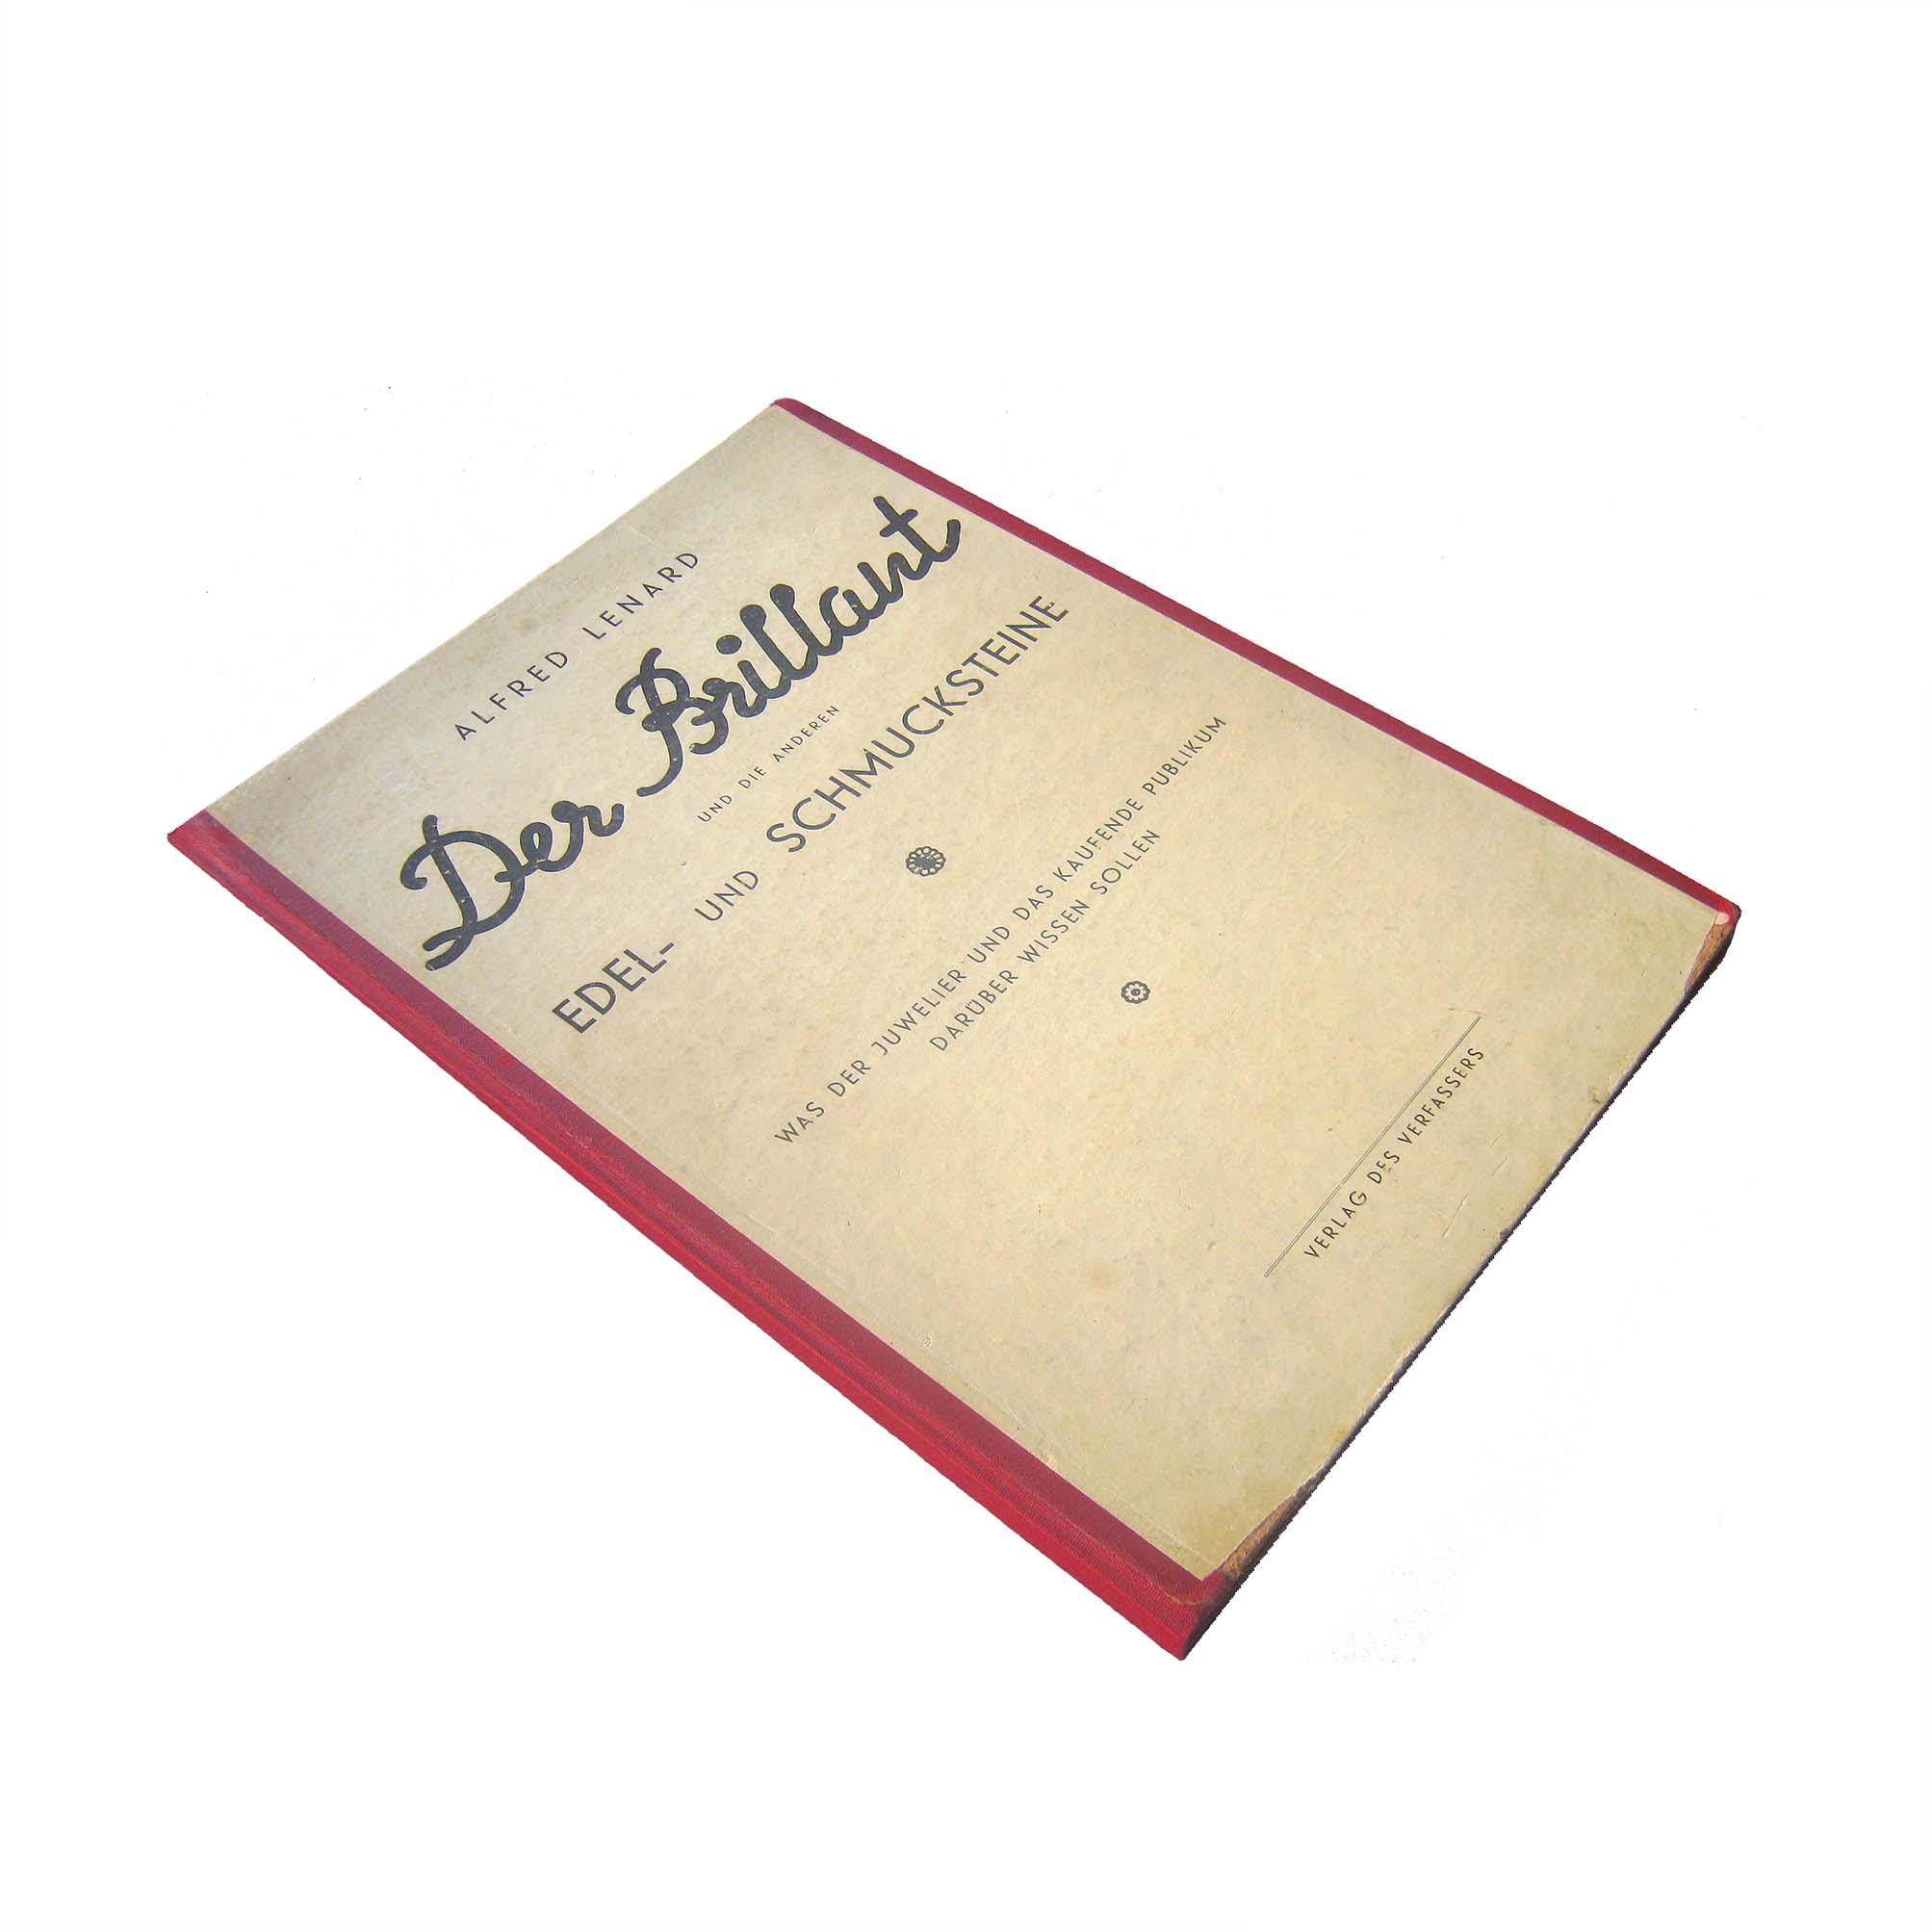 5558-Lenard-Brillant-1943-Cover-free-N.jpg